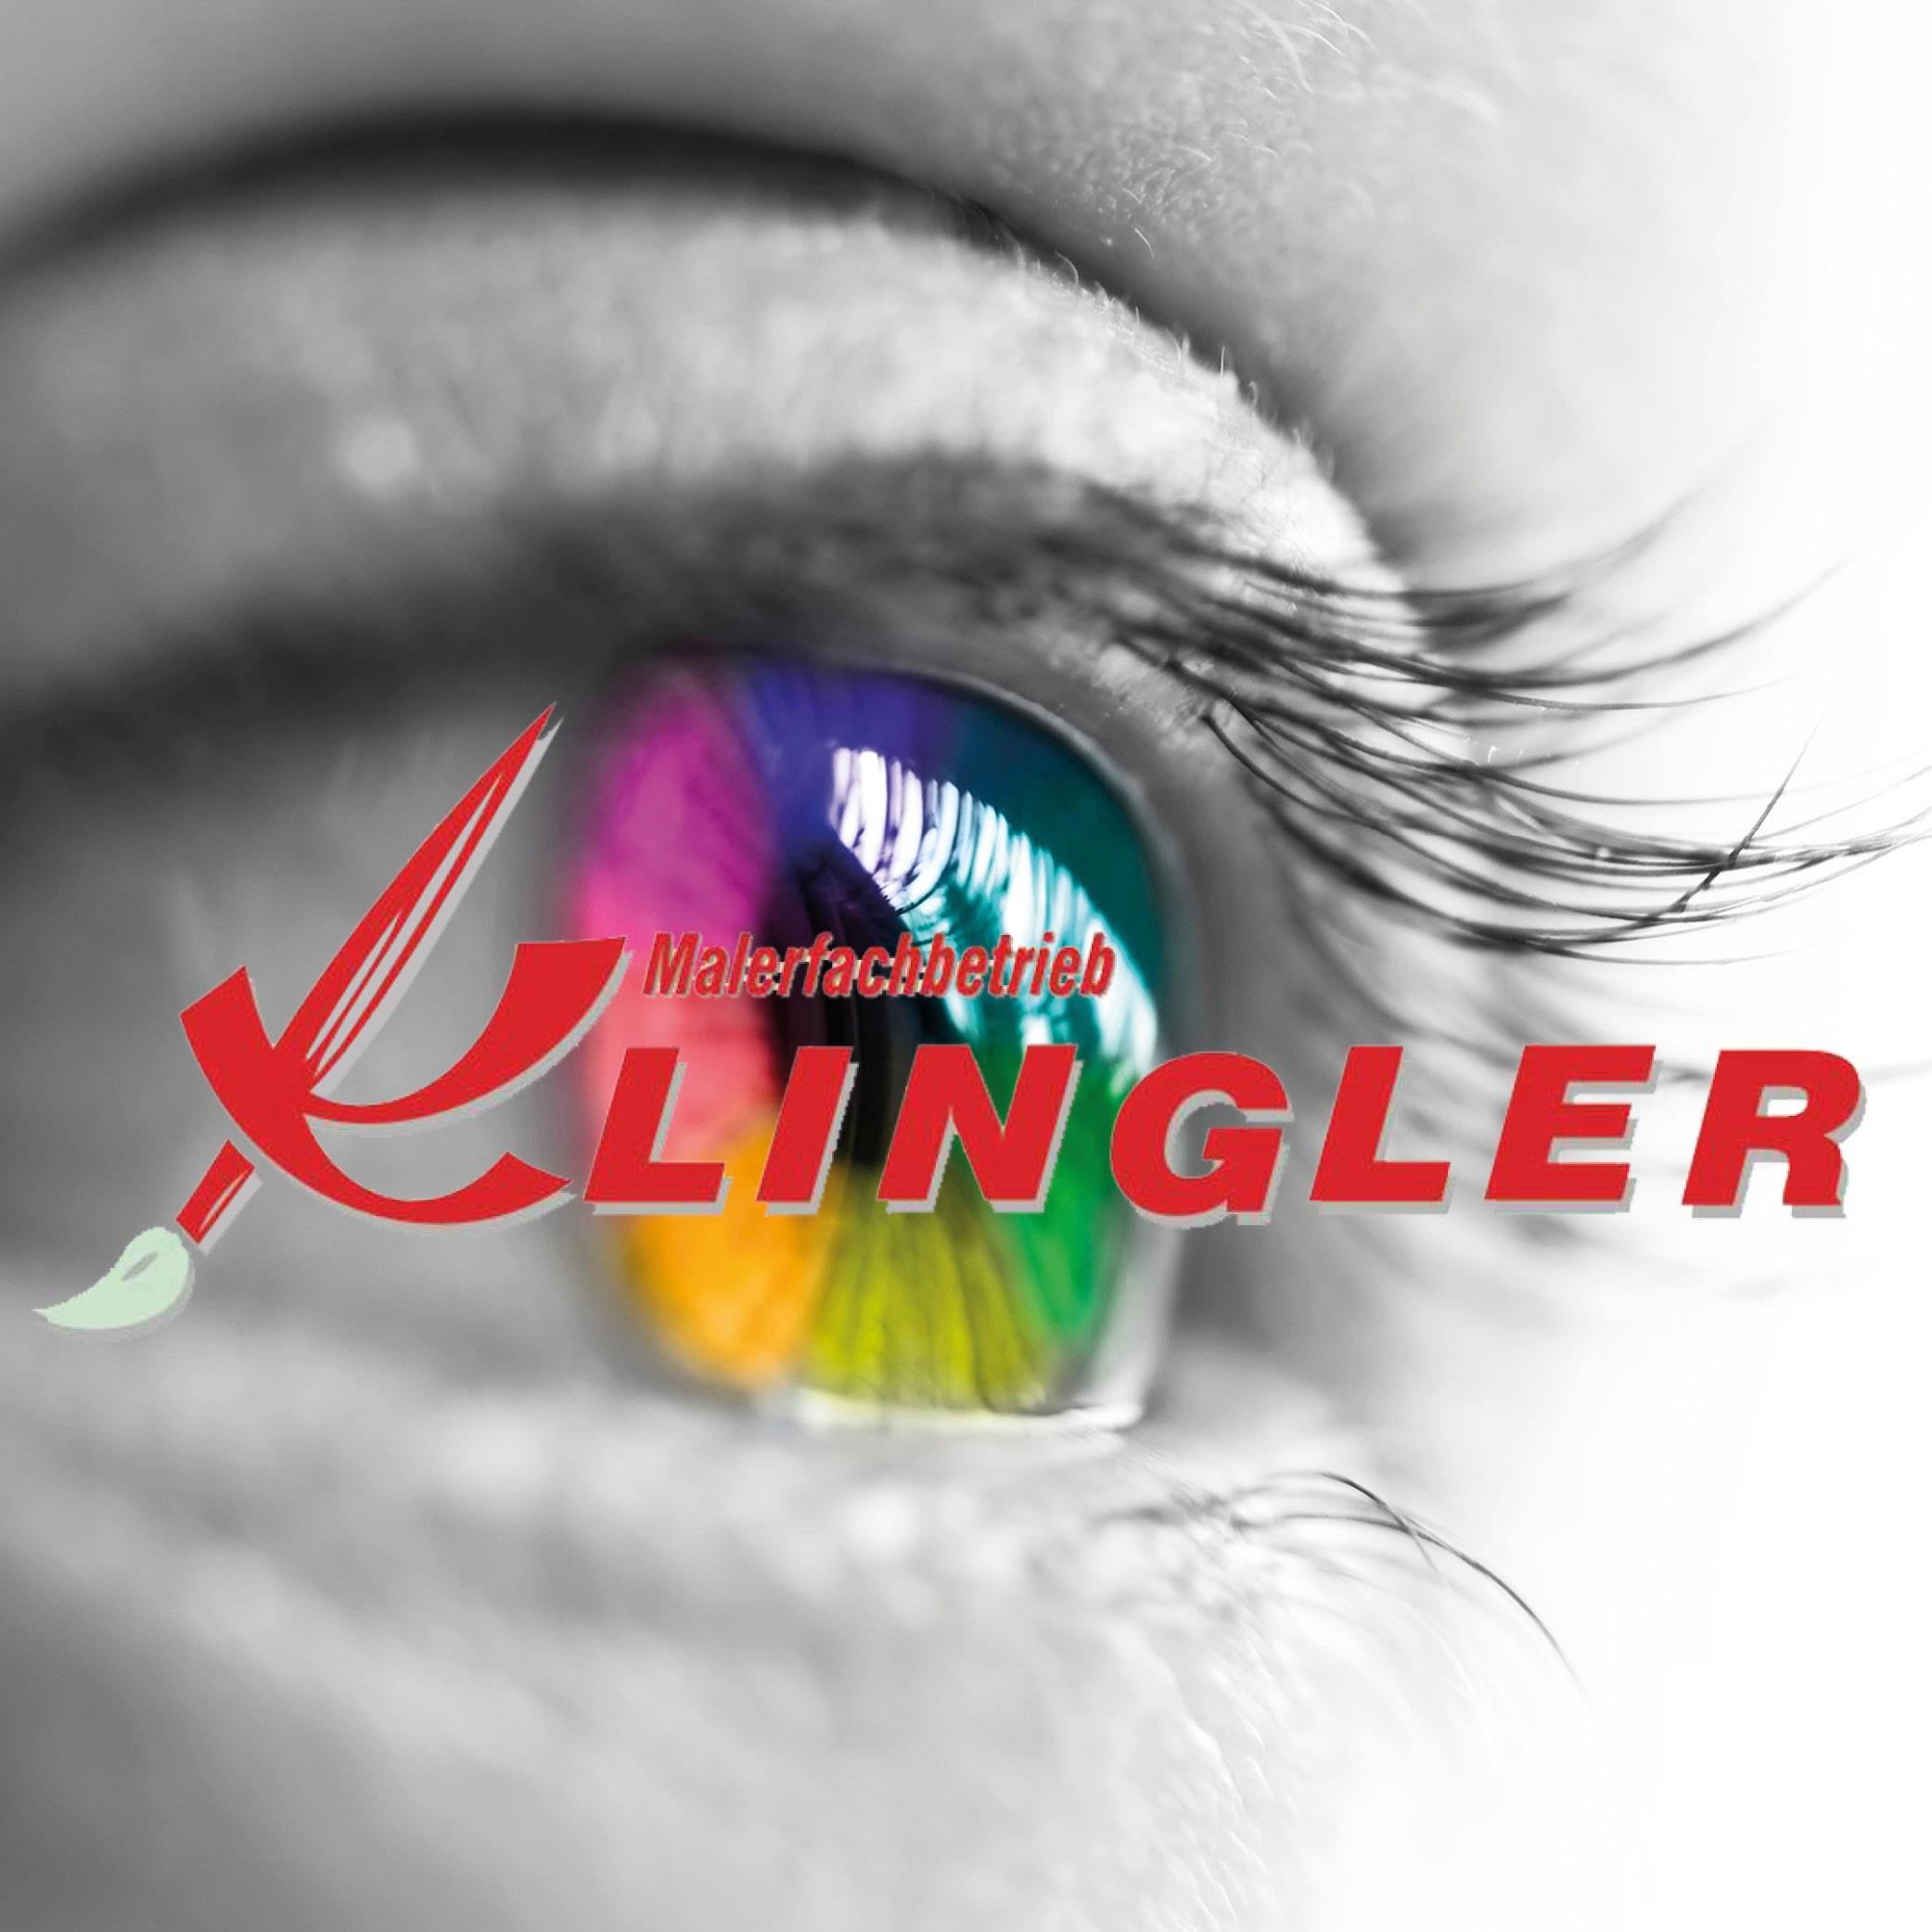 Malerfachbetrieb Klingler